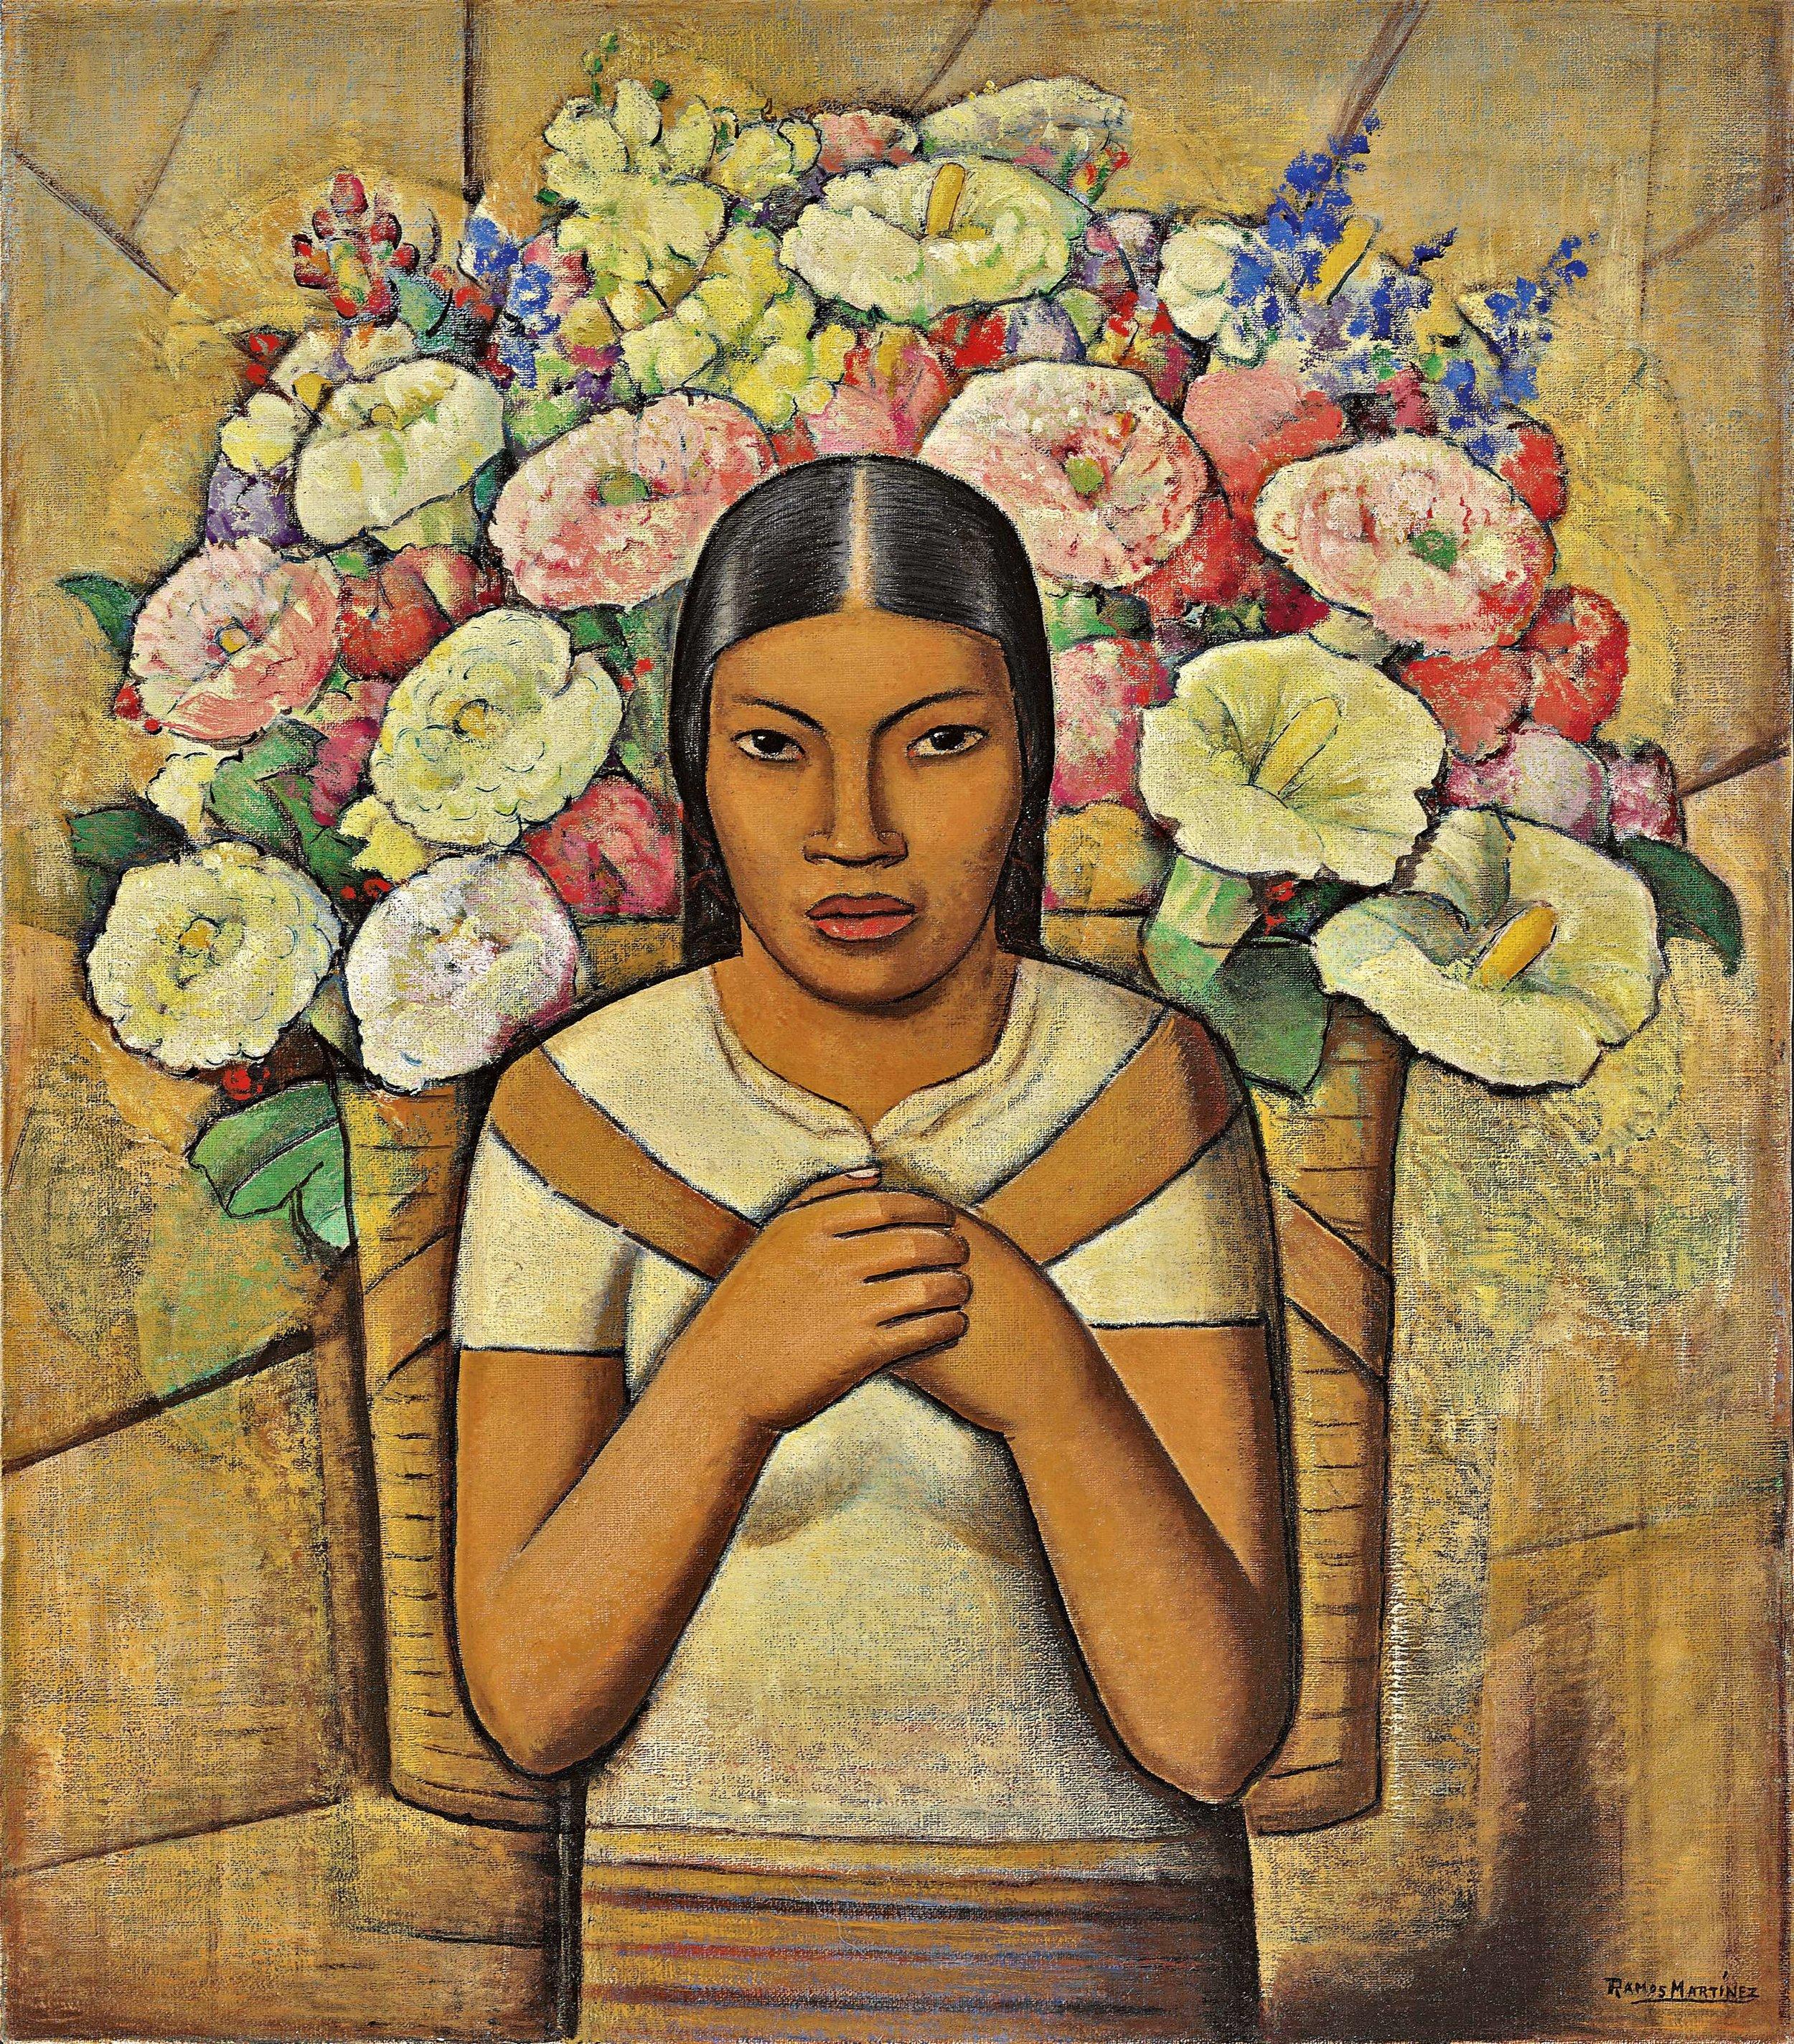 Vendora de Flores / Flower Vendor  1934 oil on canvas / óleo sobre tela 32 x 28 inches; 81.3 x 71.1 centímetros Private collections